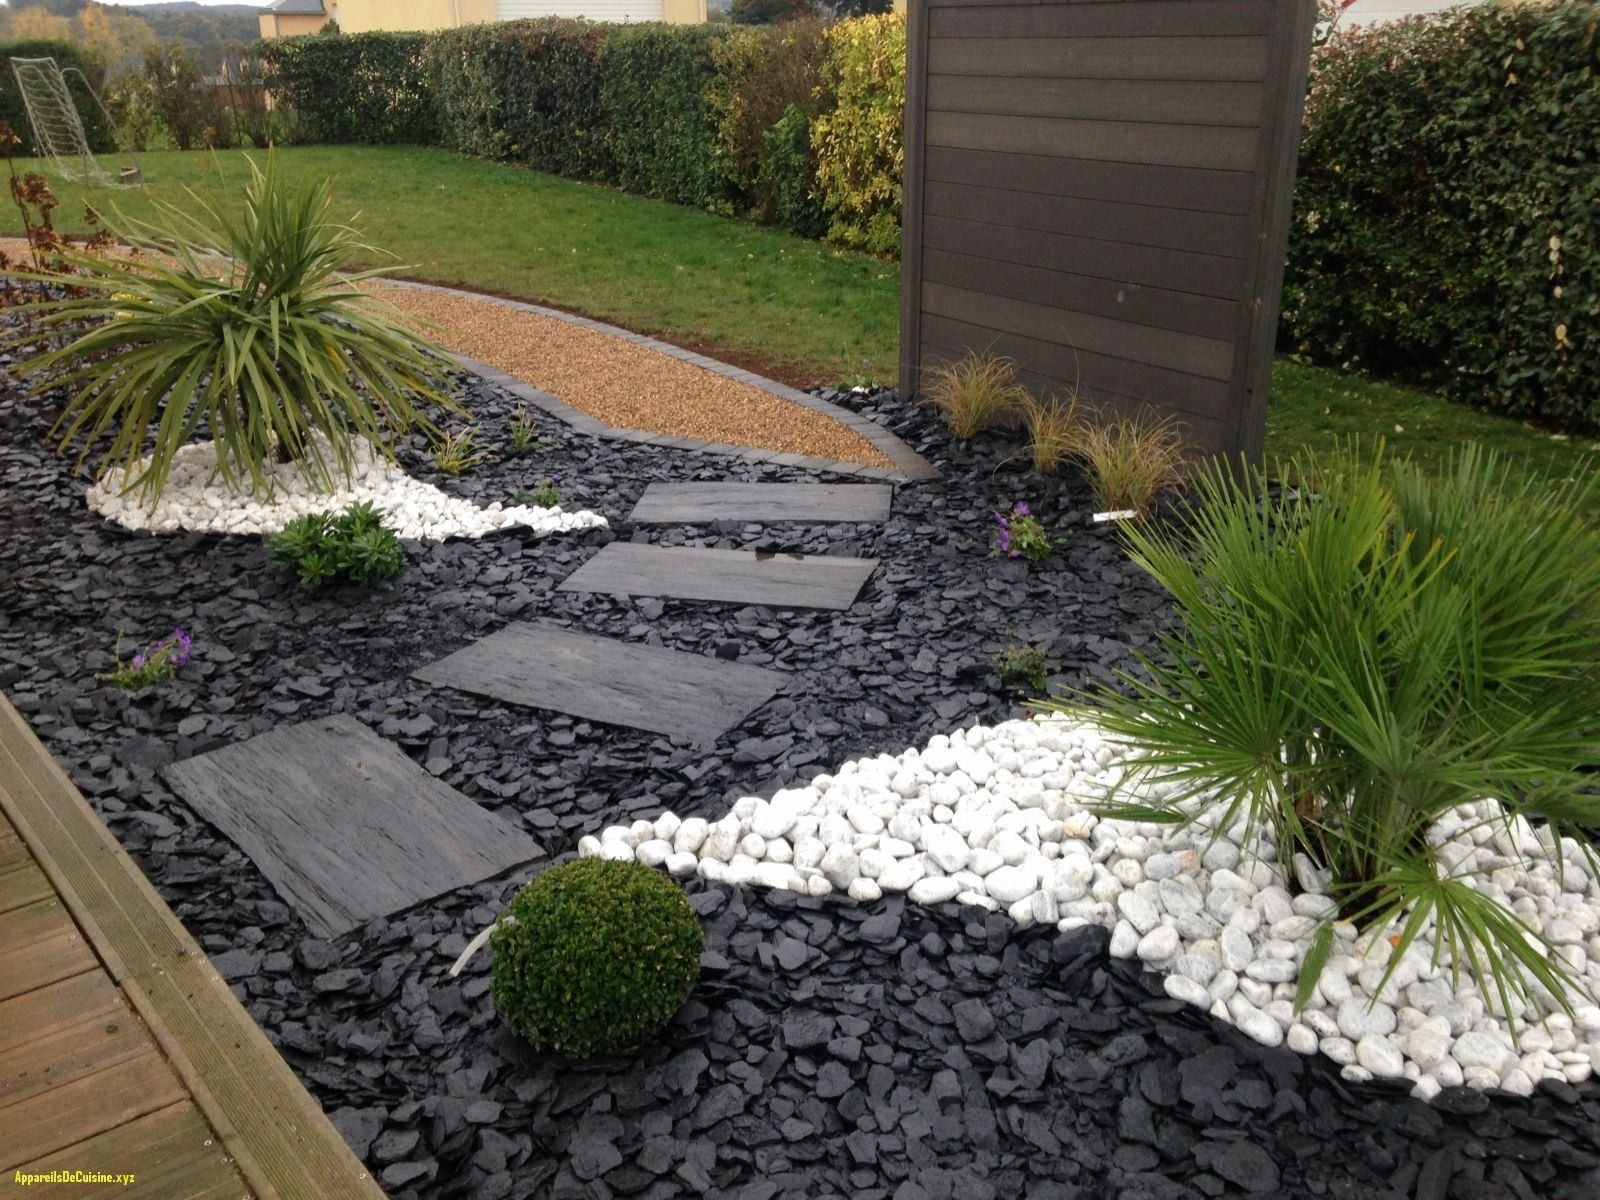 Jardin Zen Exterieur Best Of Amenagement Butte Exterieur ... concernant Decoration Jardin Zen Exterieur